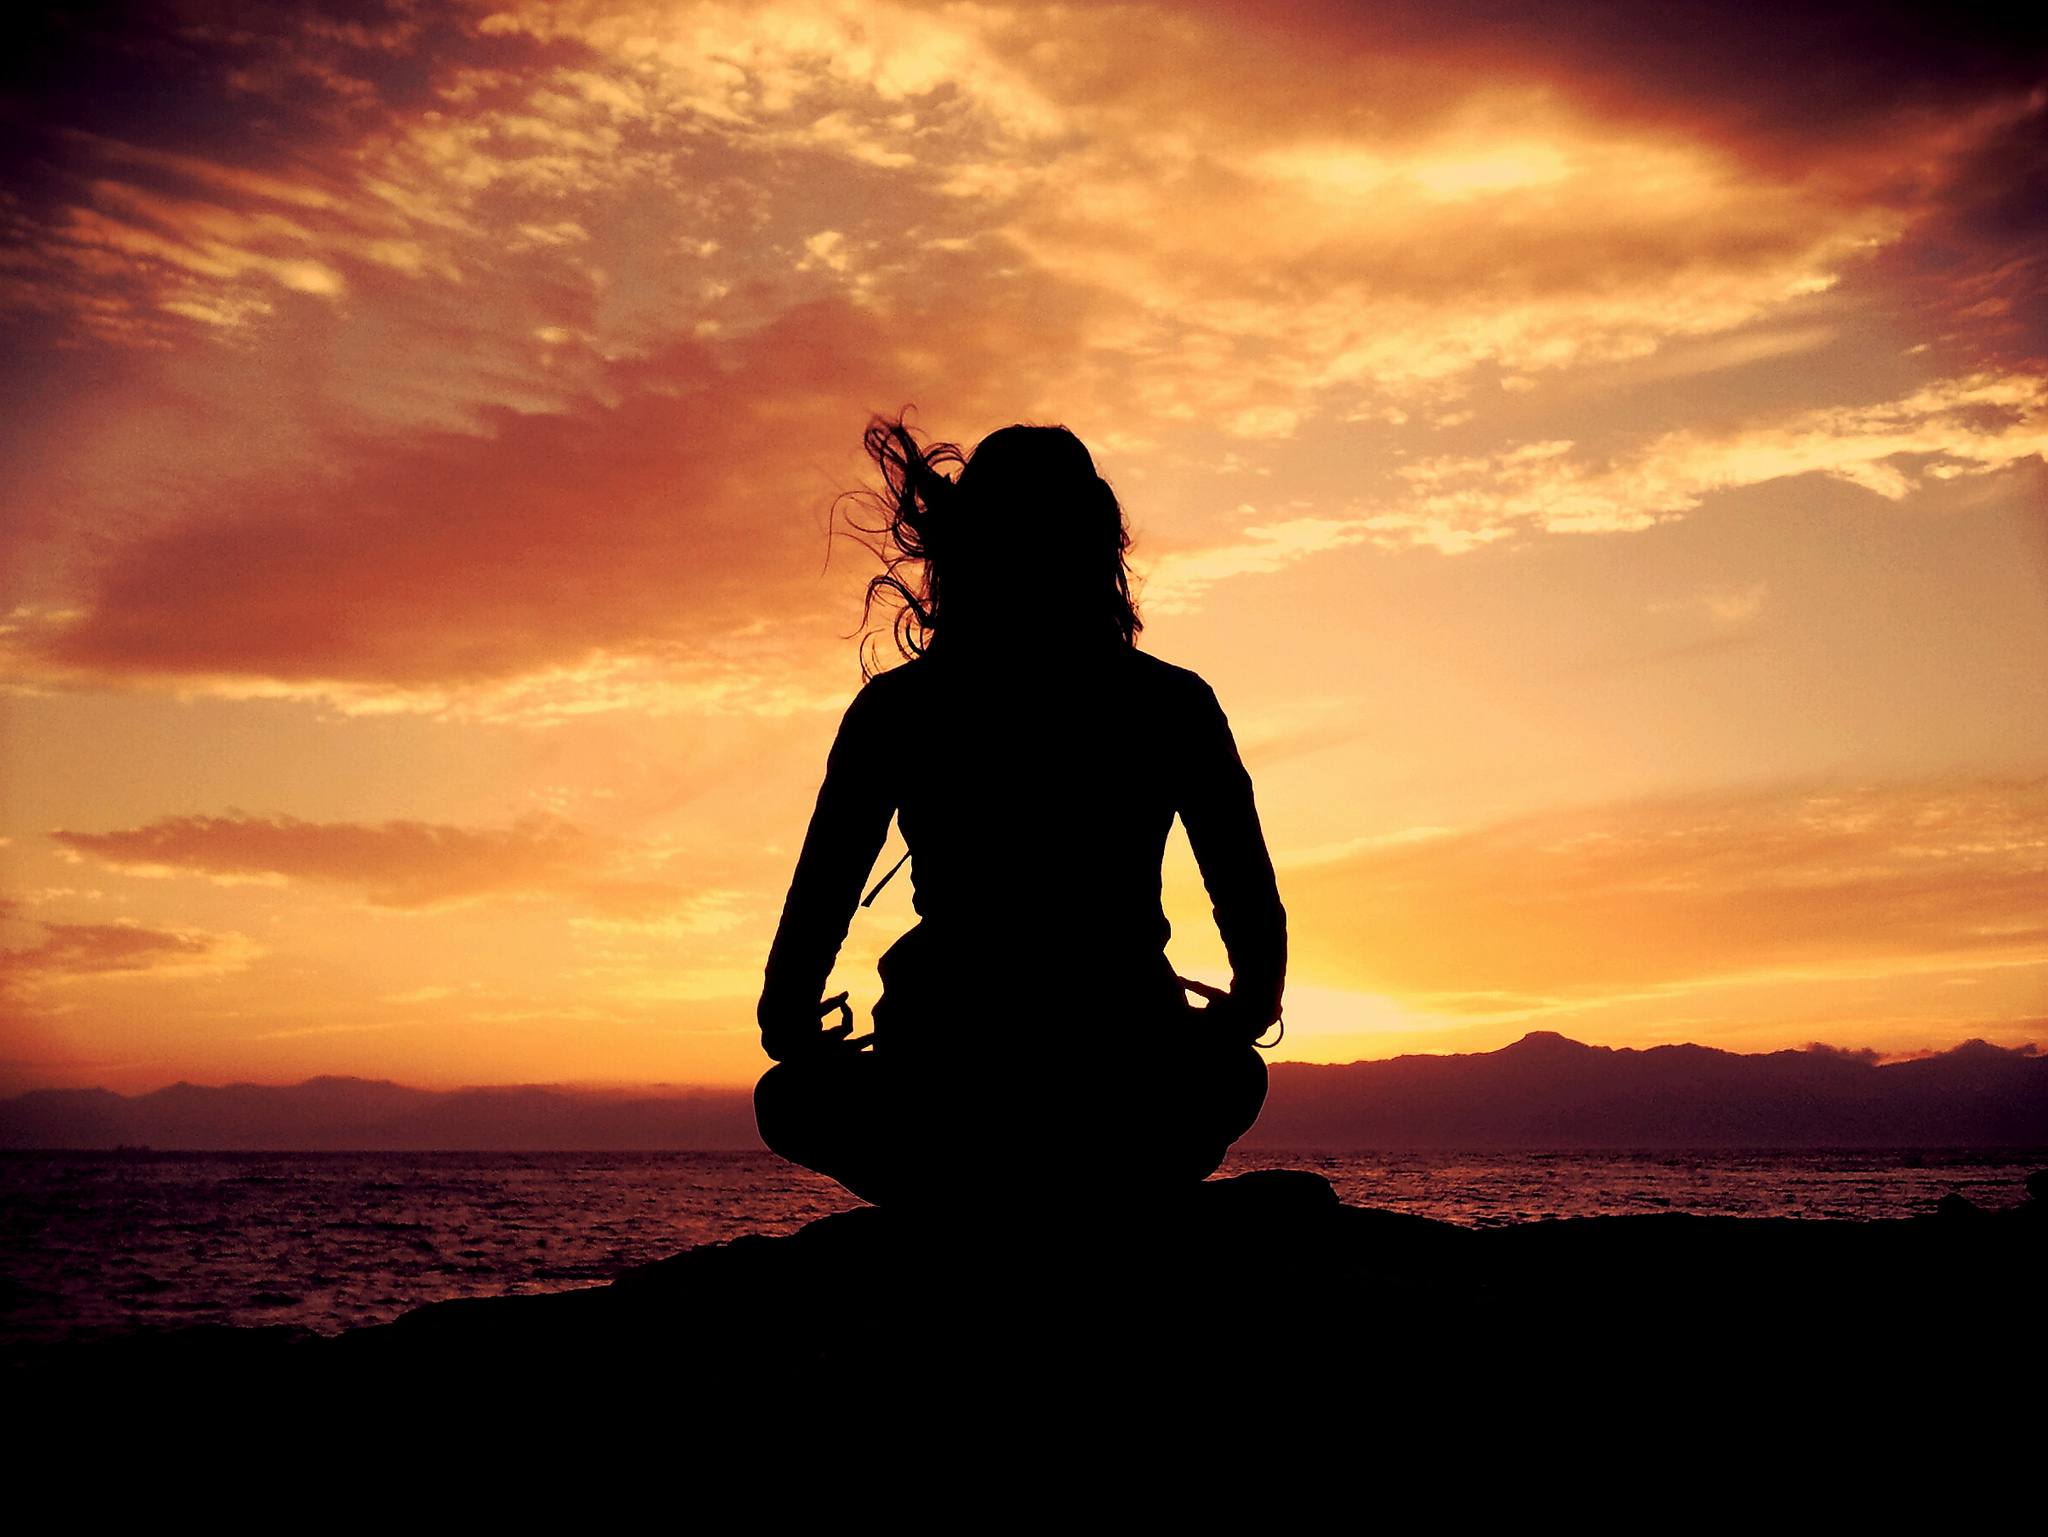 Retreat, Meditation| © Guiseppe Chirico/Pixabay